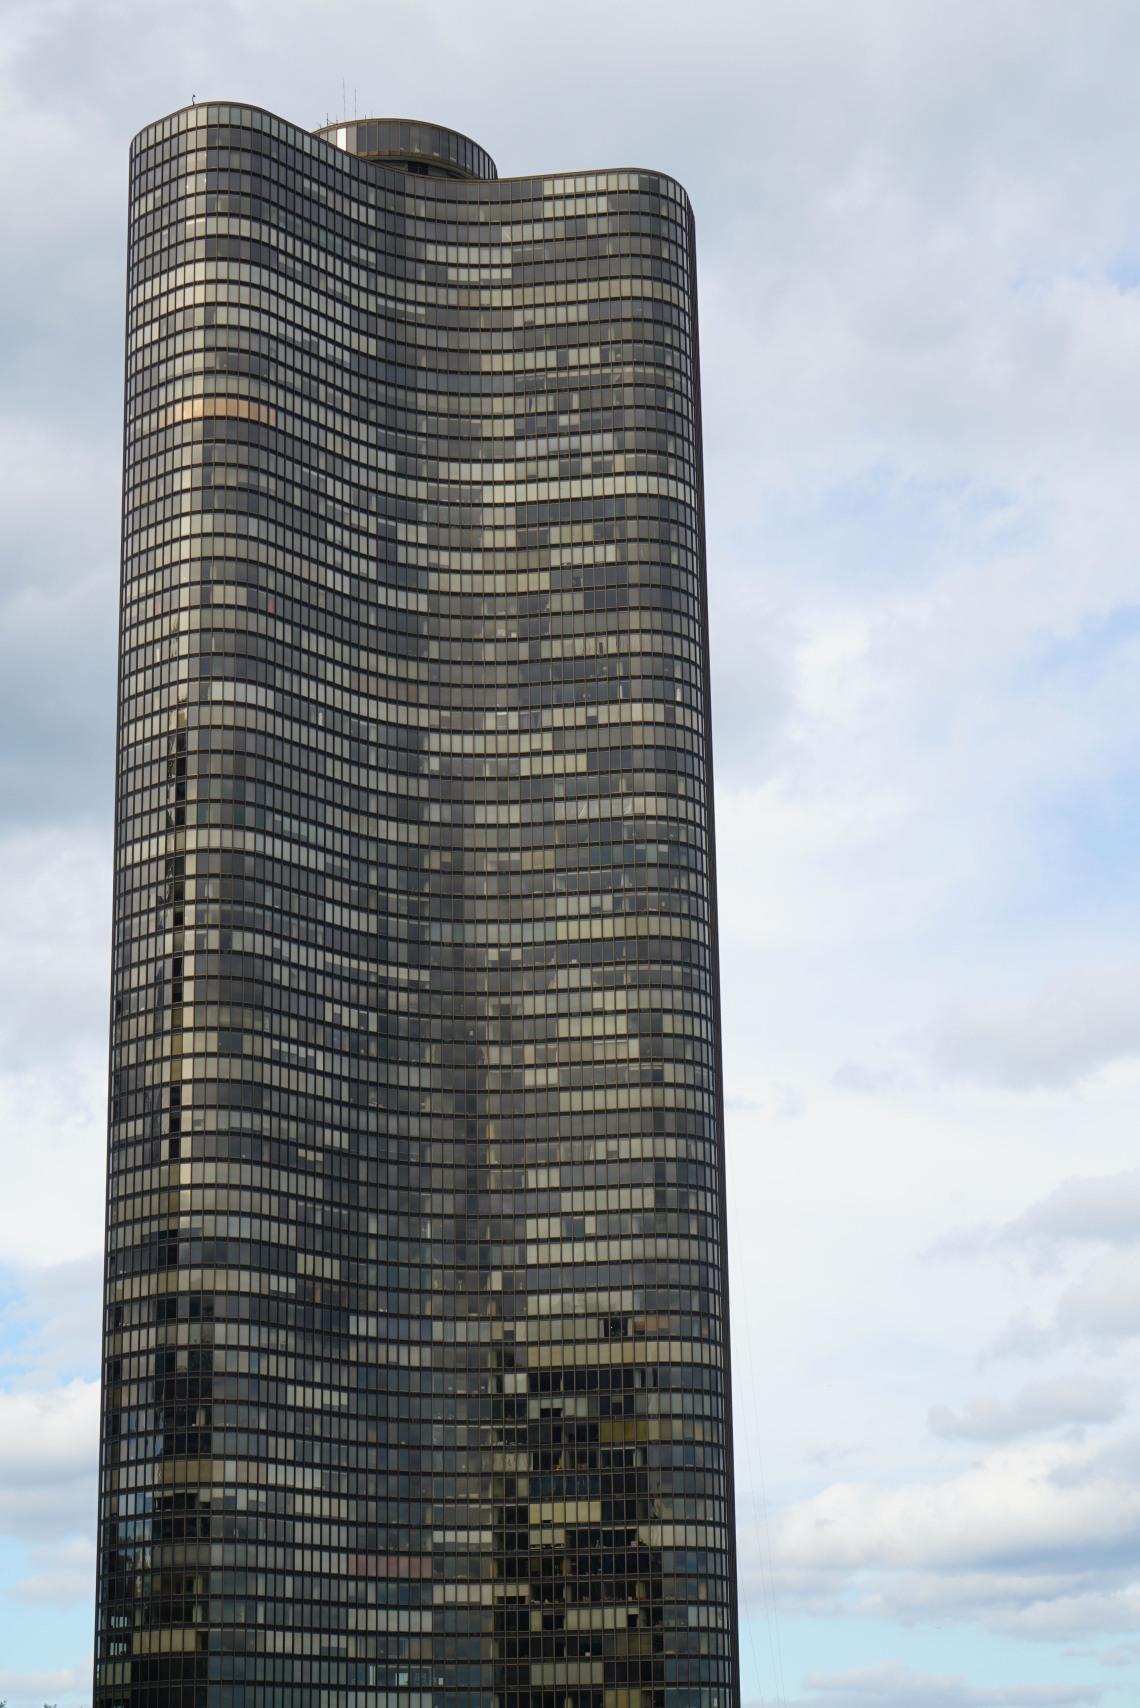 ChicagoarchitecturetourSept2019-15